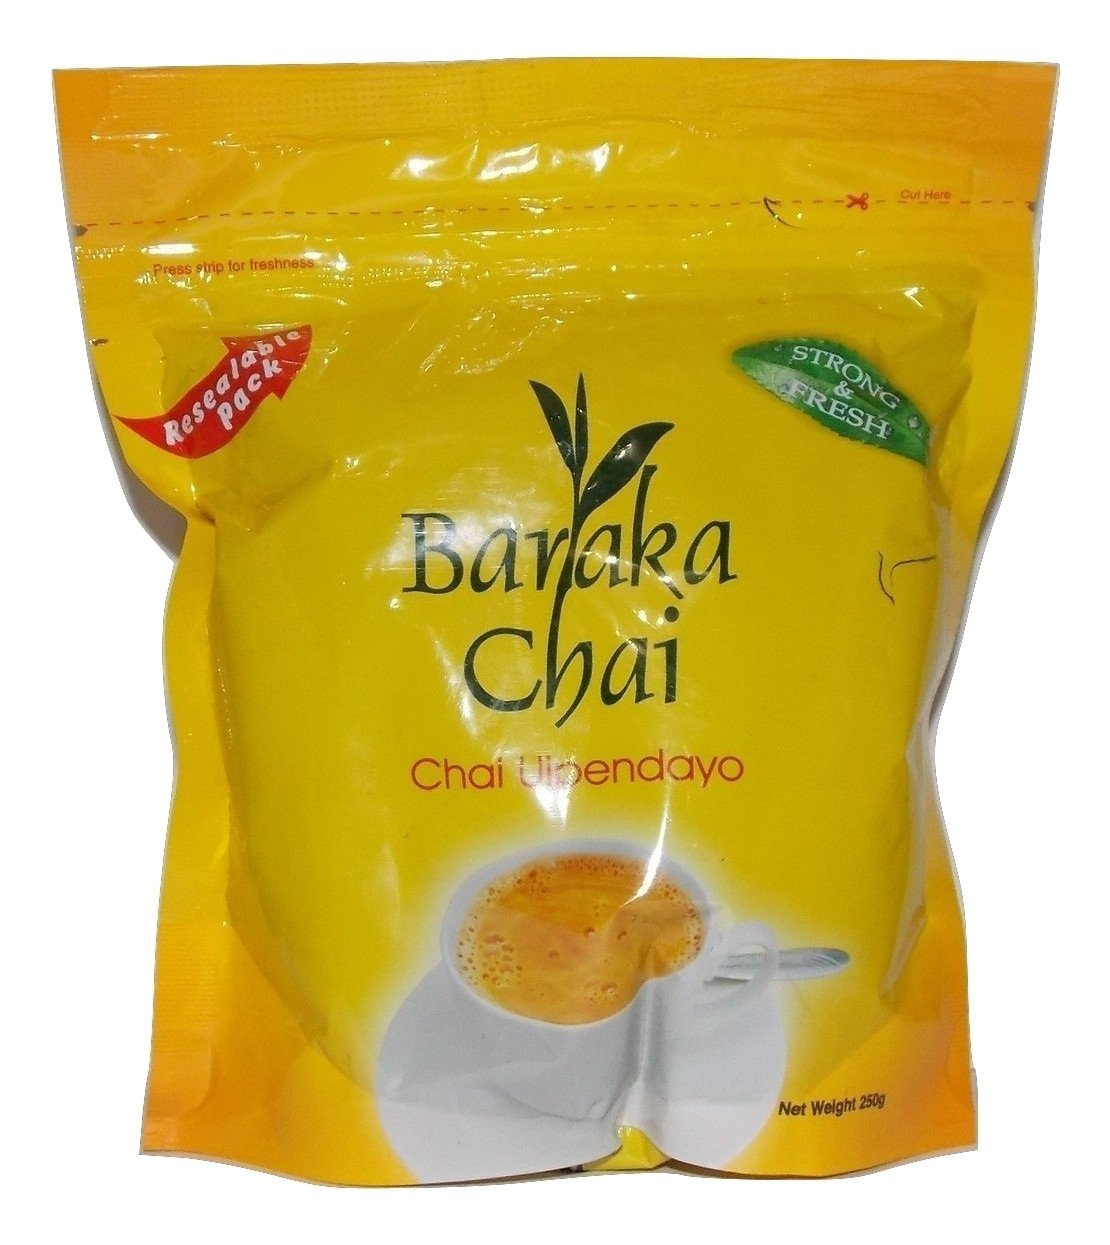 Baraka chai tea leaves from Kenya-500GMS